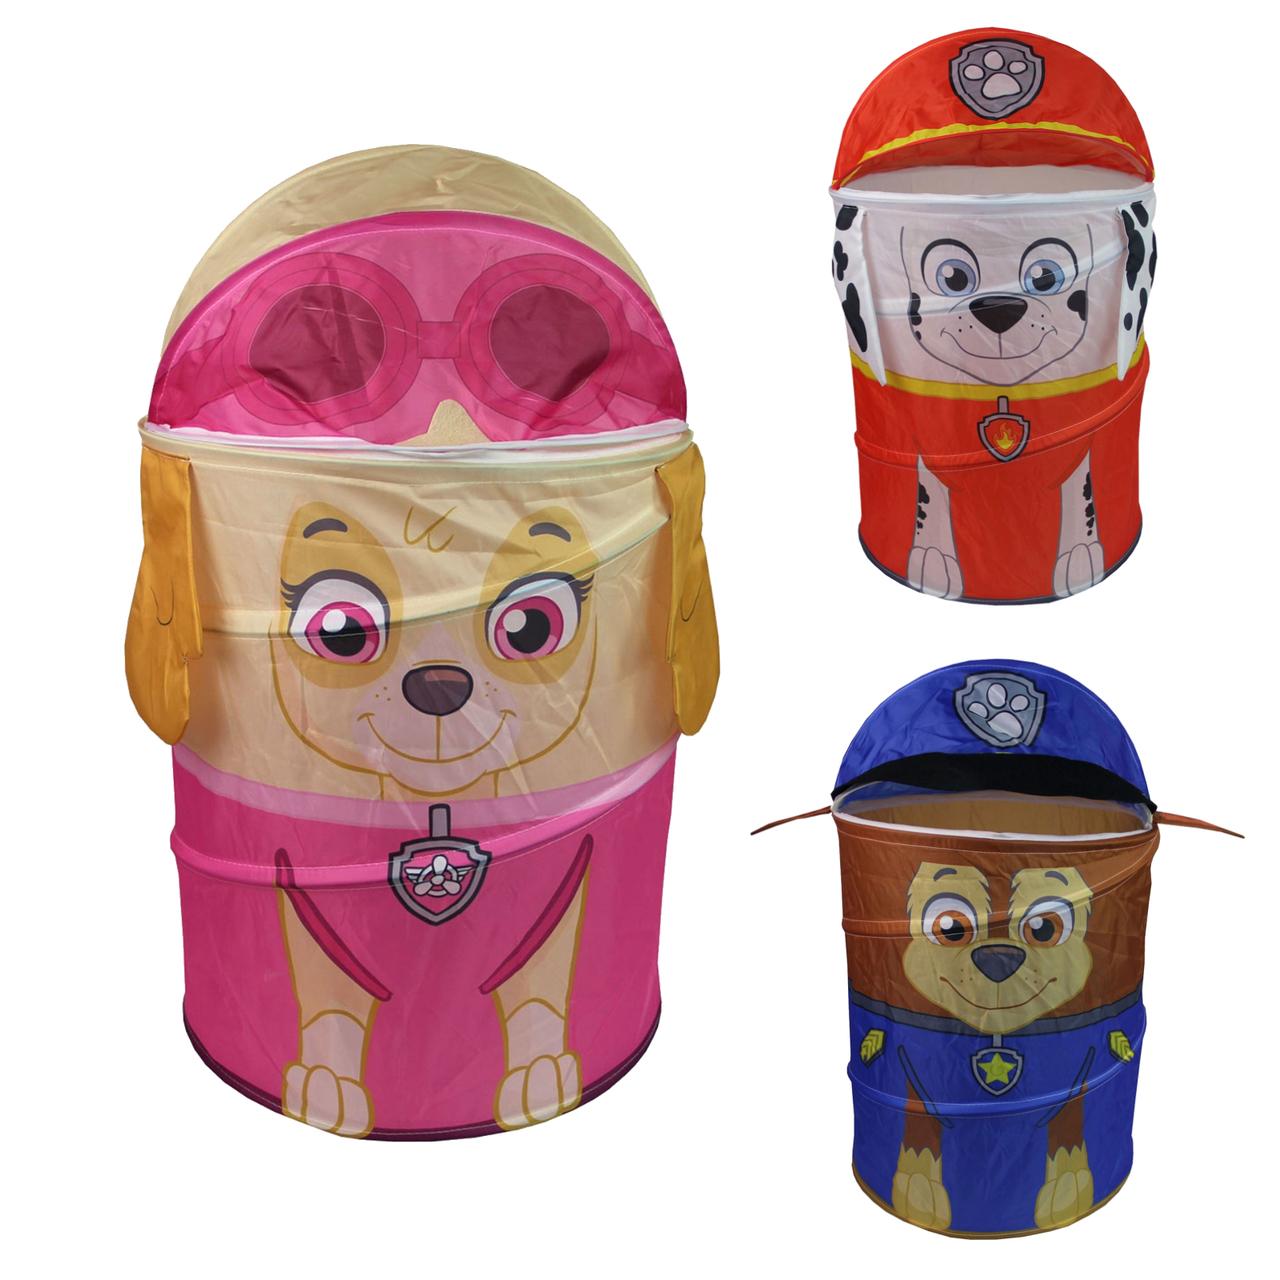 Full Size of Paw Patrol Character 3d Pop Up Kinderzimmer Wschekorb Regal Weiß Sofa Regale Kinderzimmer Wäschekorb Kinderzimmer